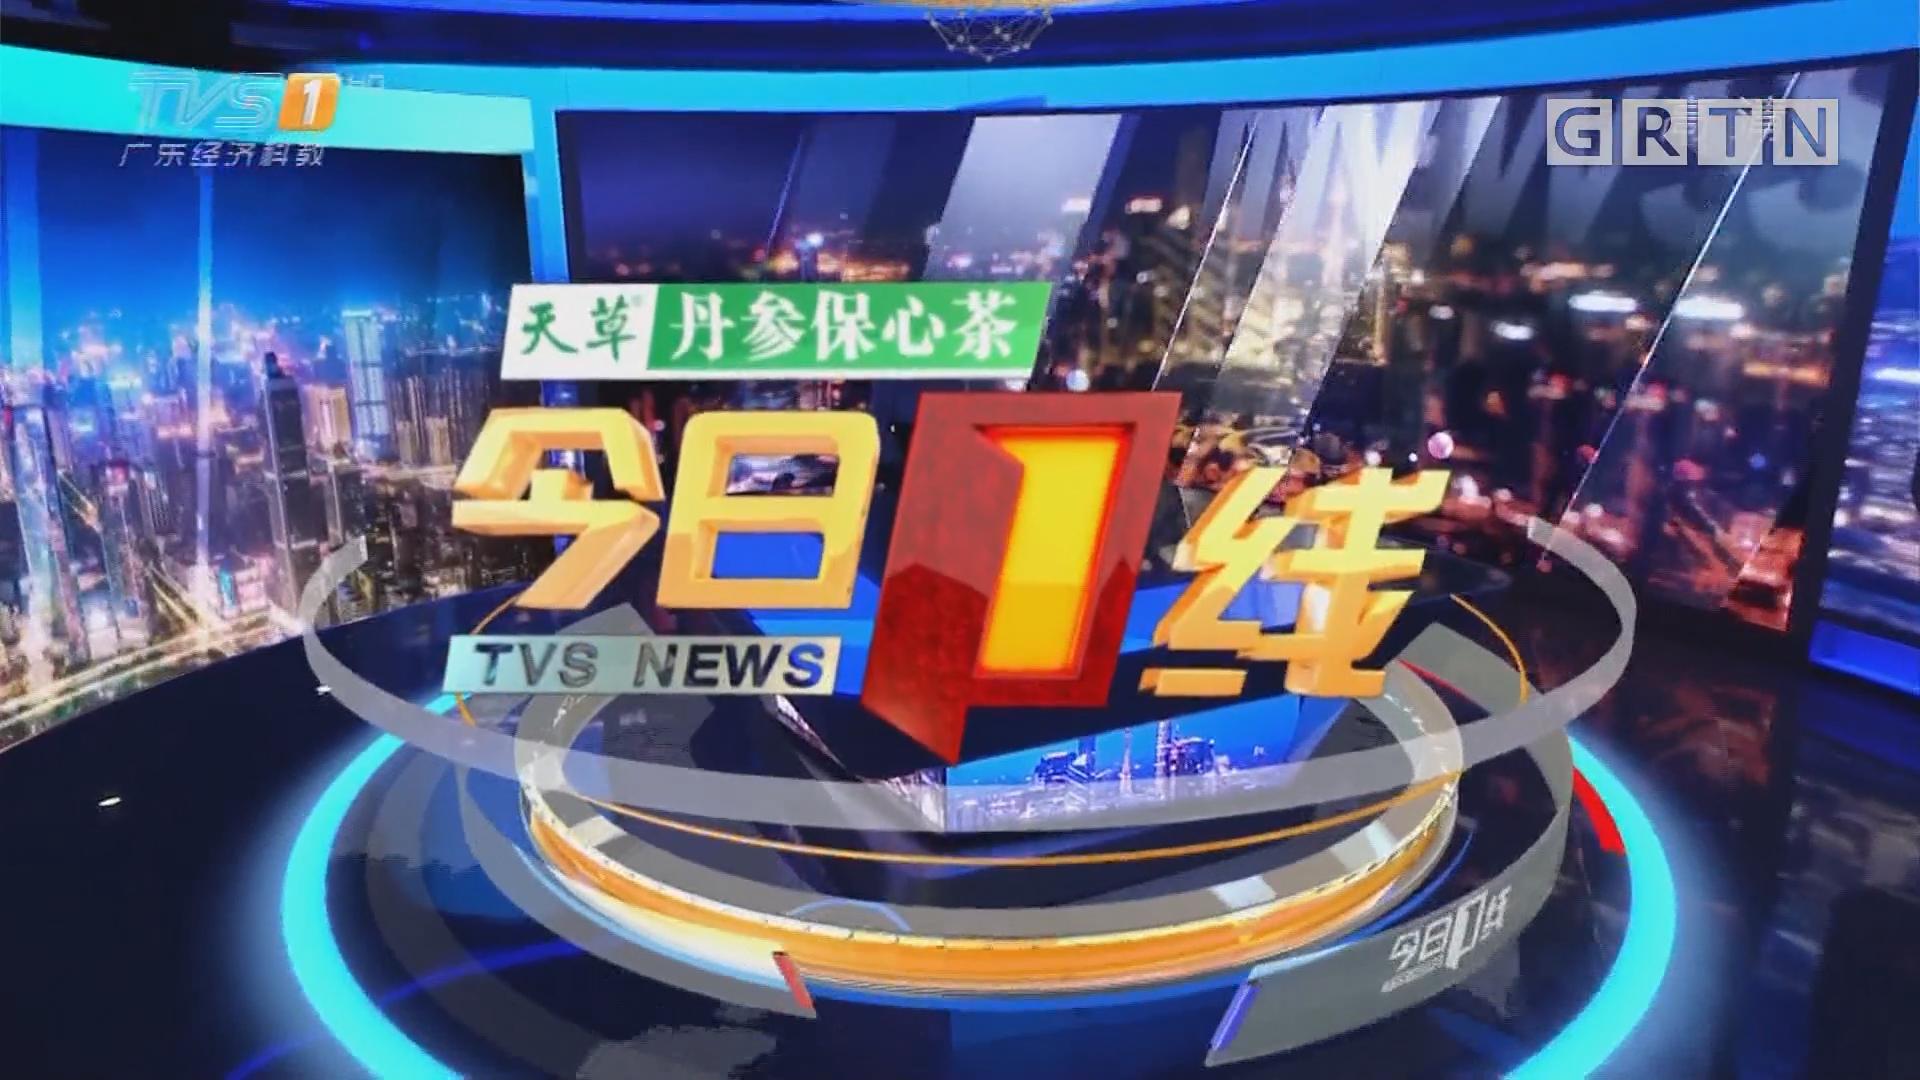 [HD][2019-01-14]今日一线:天气:冷空气明晚杀到 广州最低温9℃